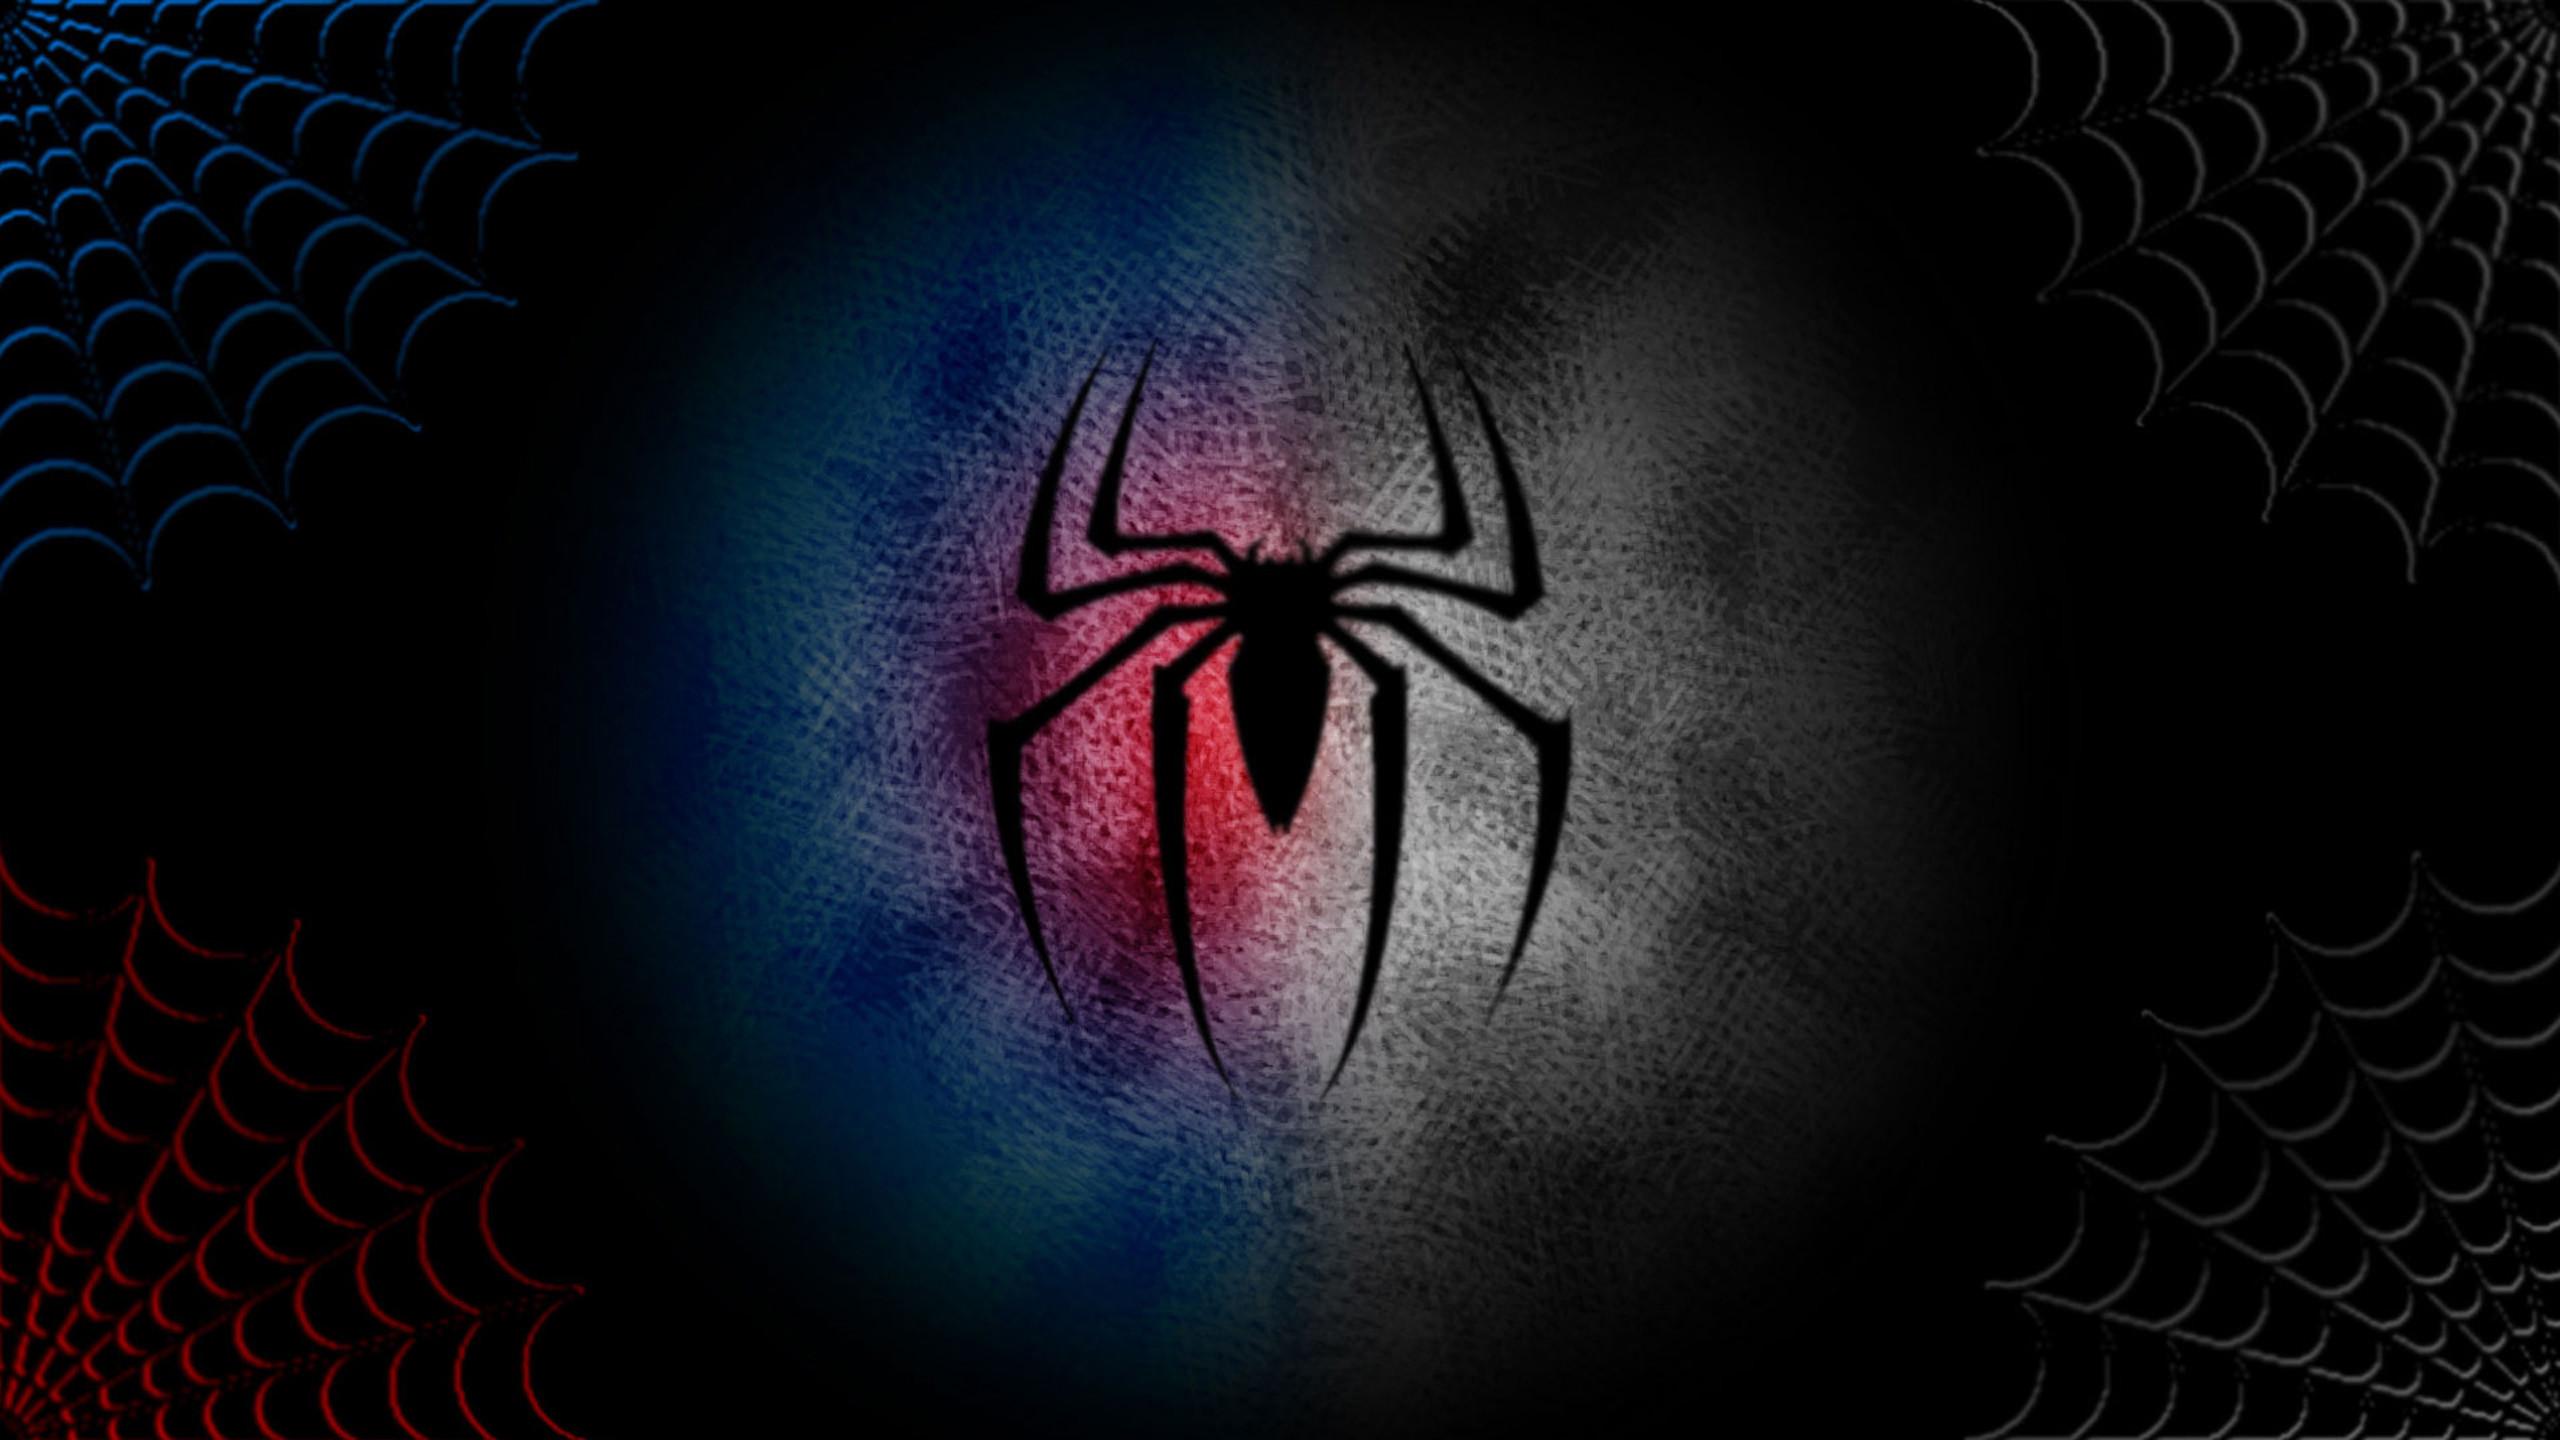 Spiderman logo wallpaper, HD Desktop Wallpapers